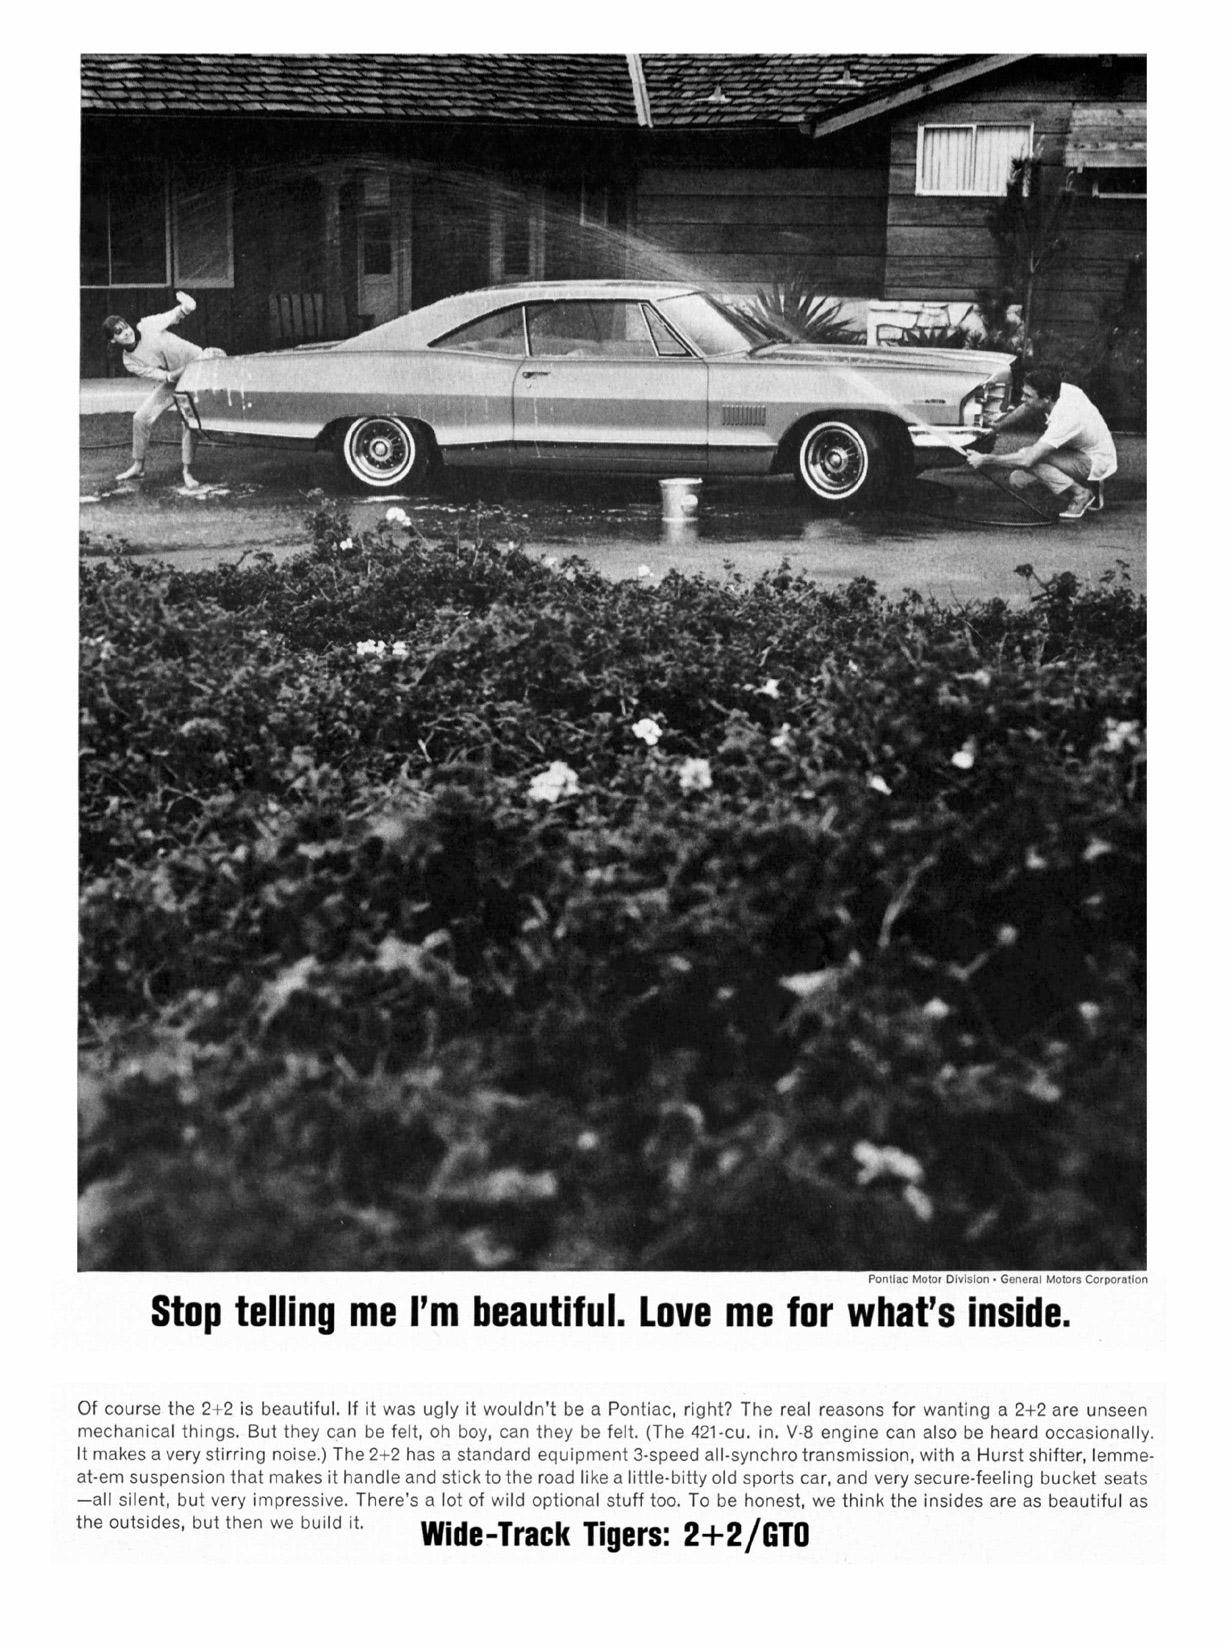 Pontiac 2+2 Ad black and white